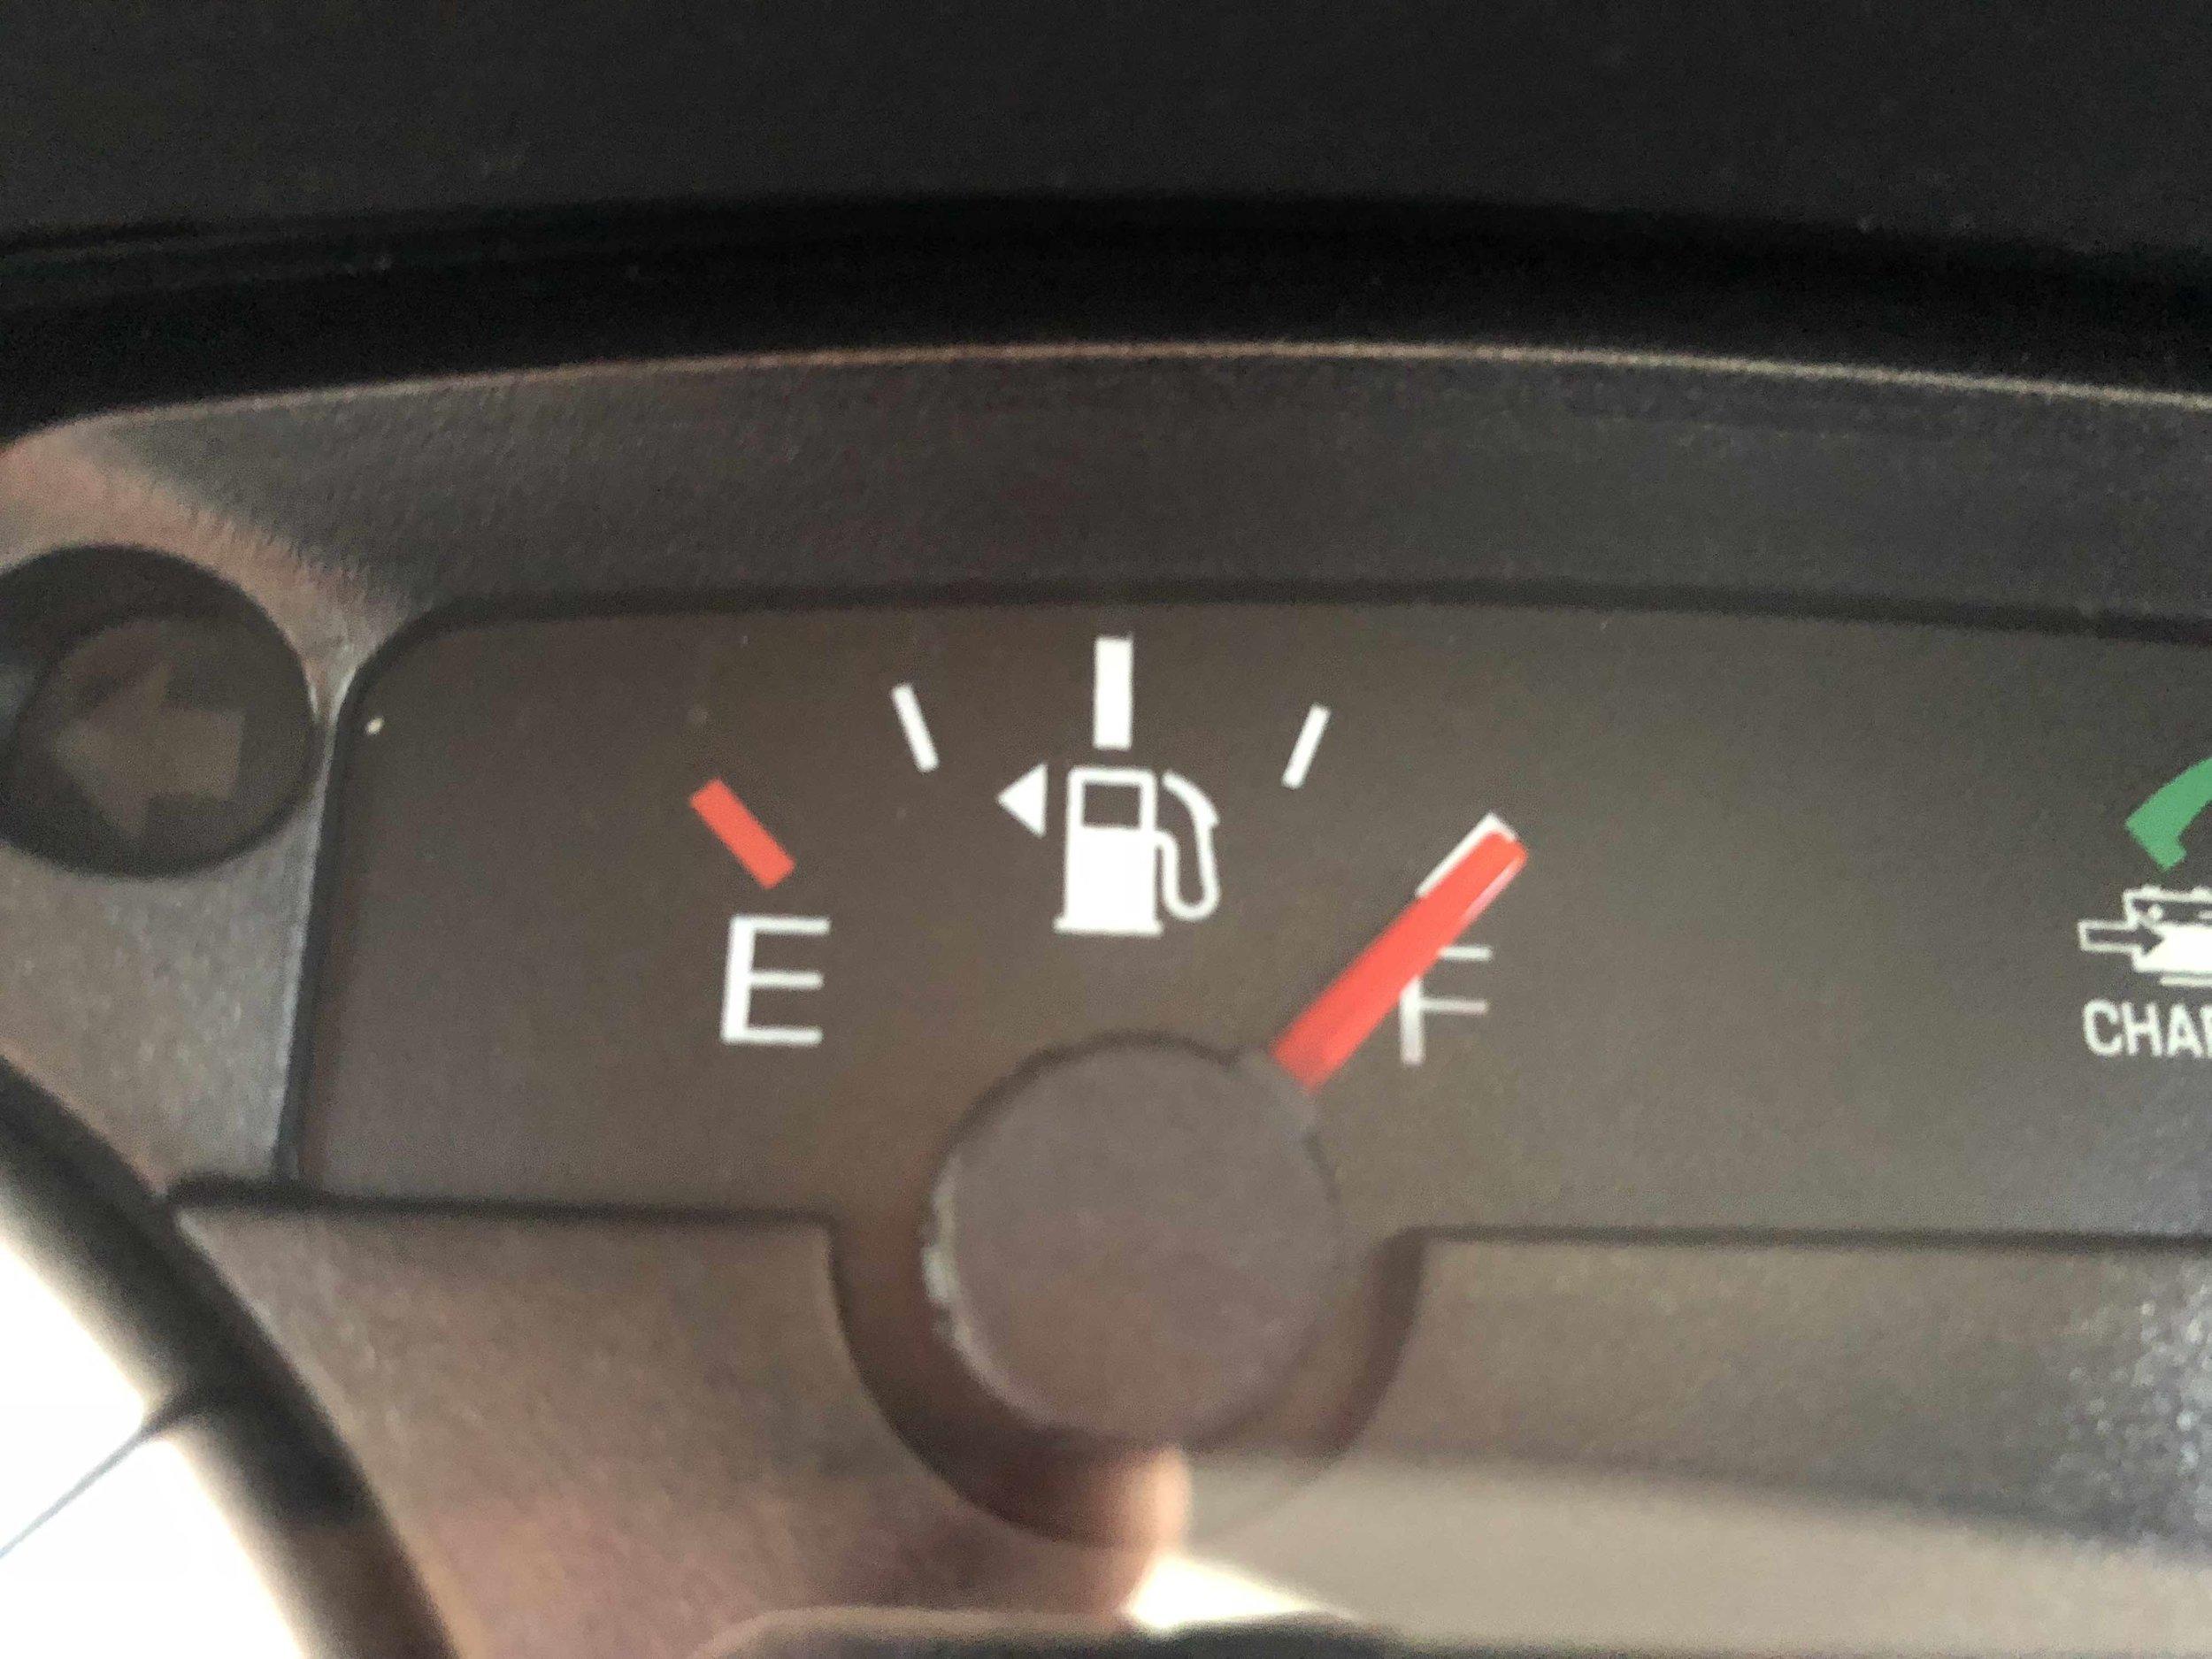 Full tank of gas - ✓